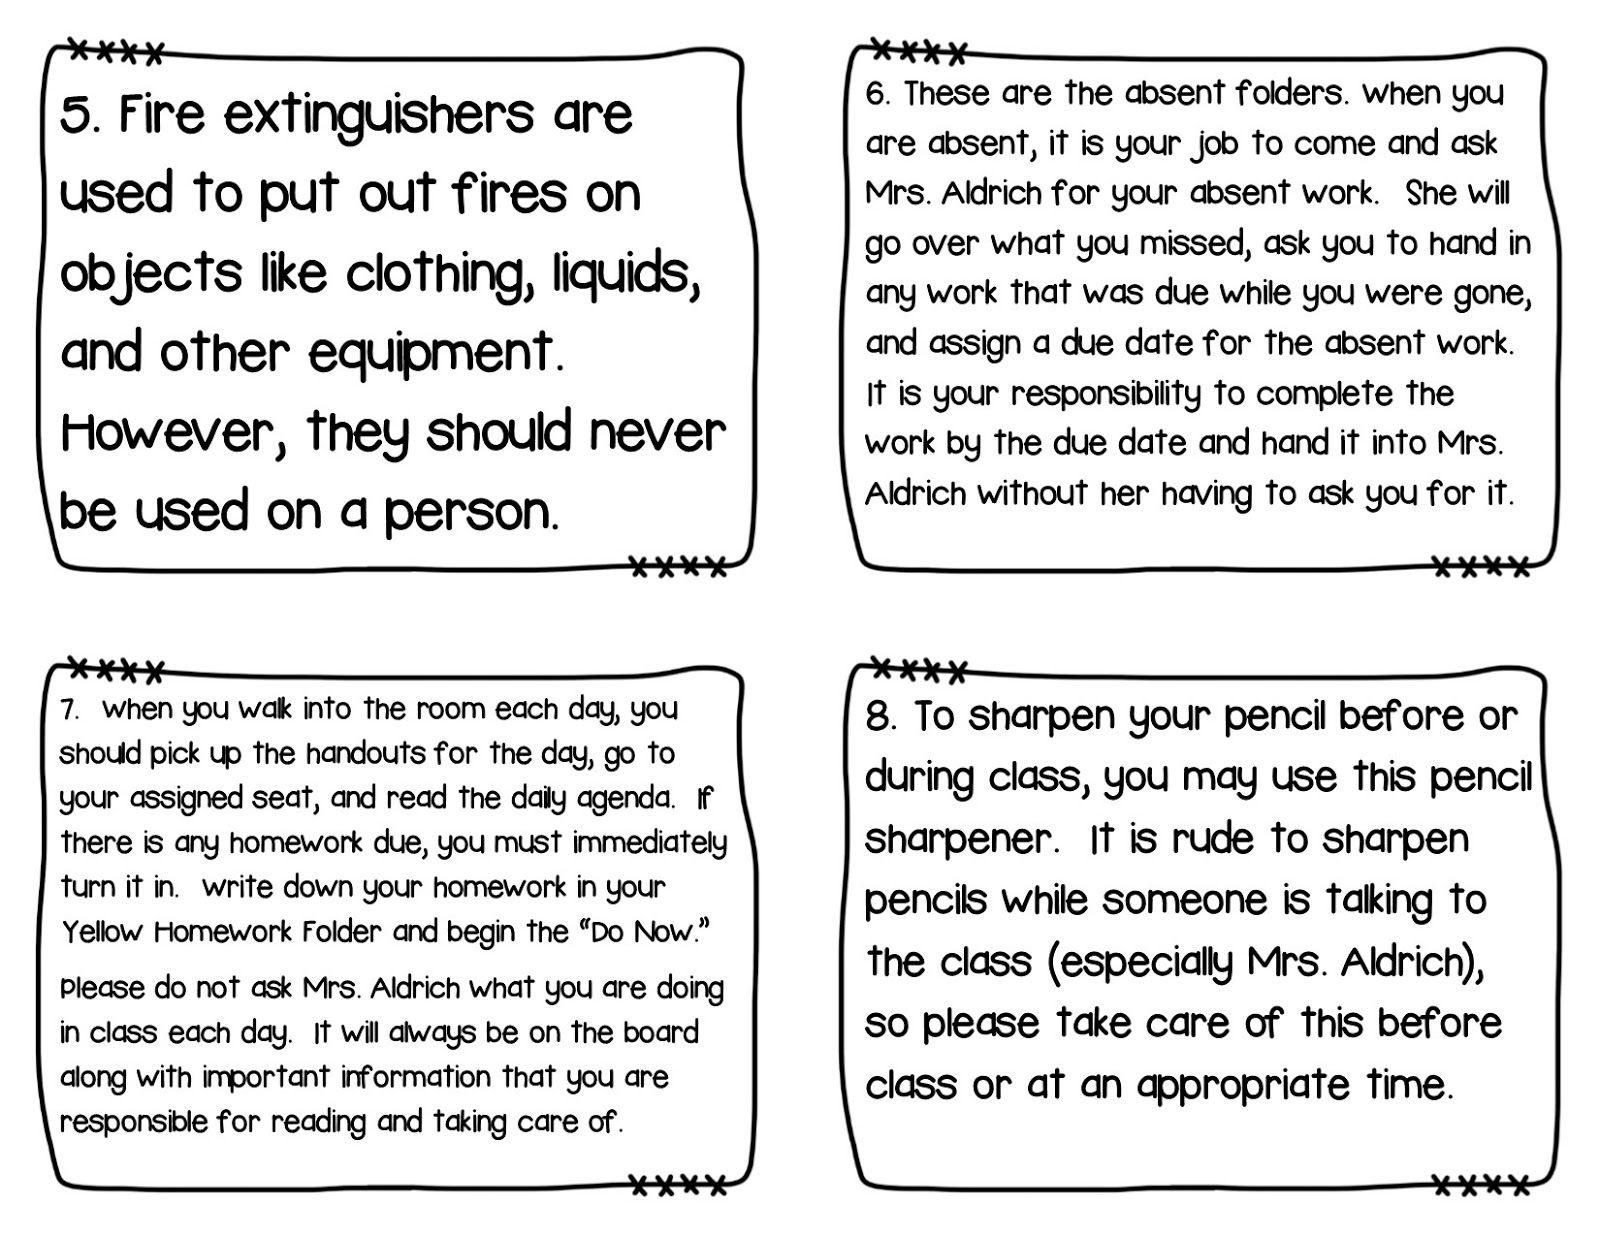 Classroom Scavenger Hunt To Teach Procedures Interesting